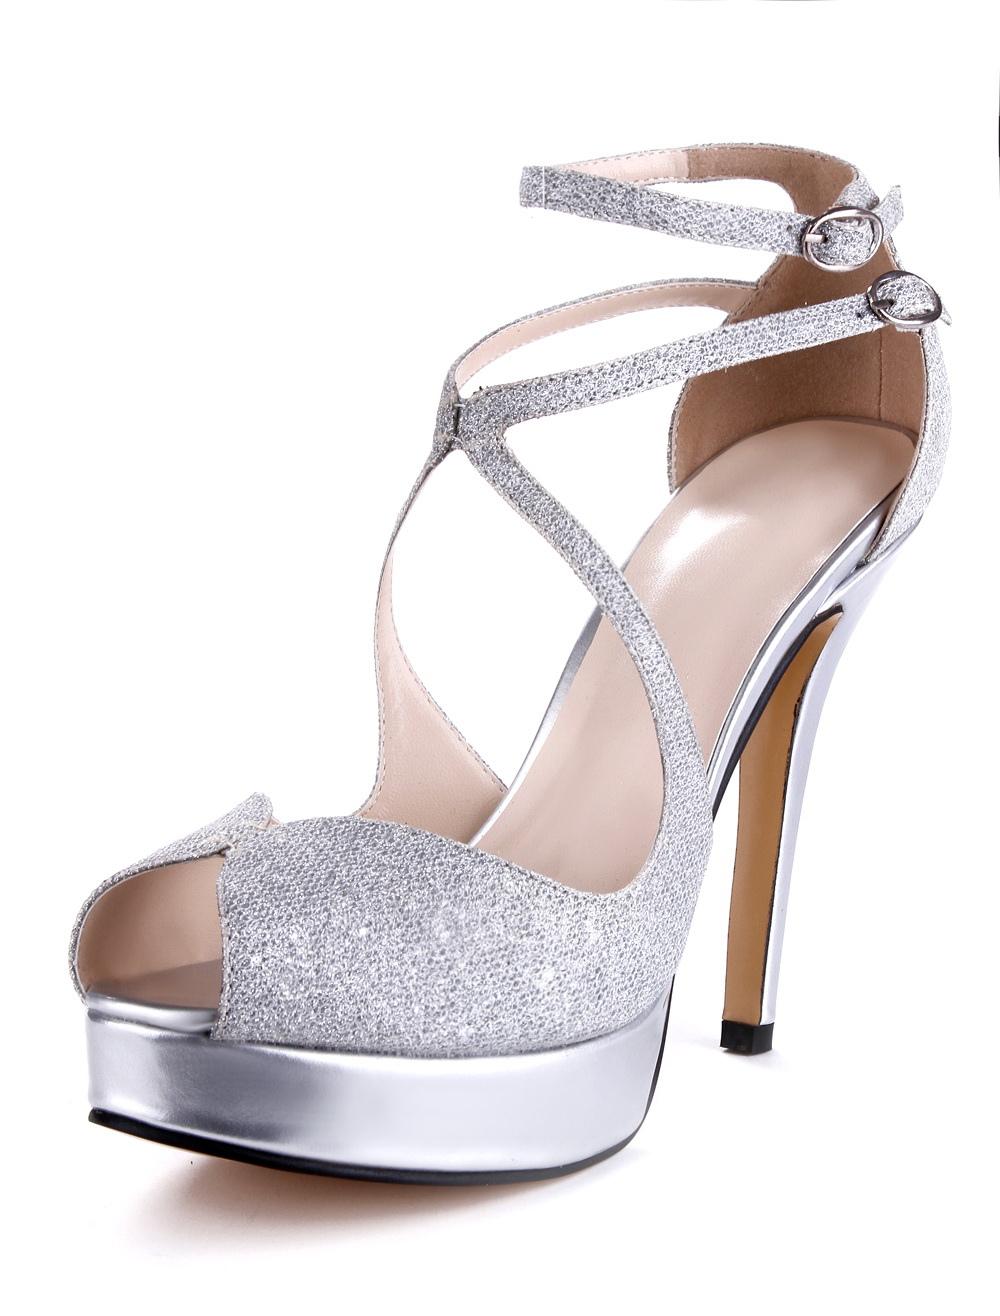 Buy Women Silver Sandals High Heel Sandals Glitter Platform Peep Toe Criss Cross Party Shoes for $44.99 in Milanoo store